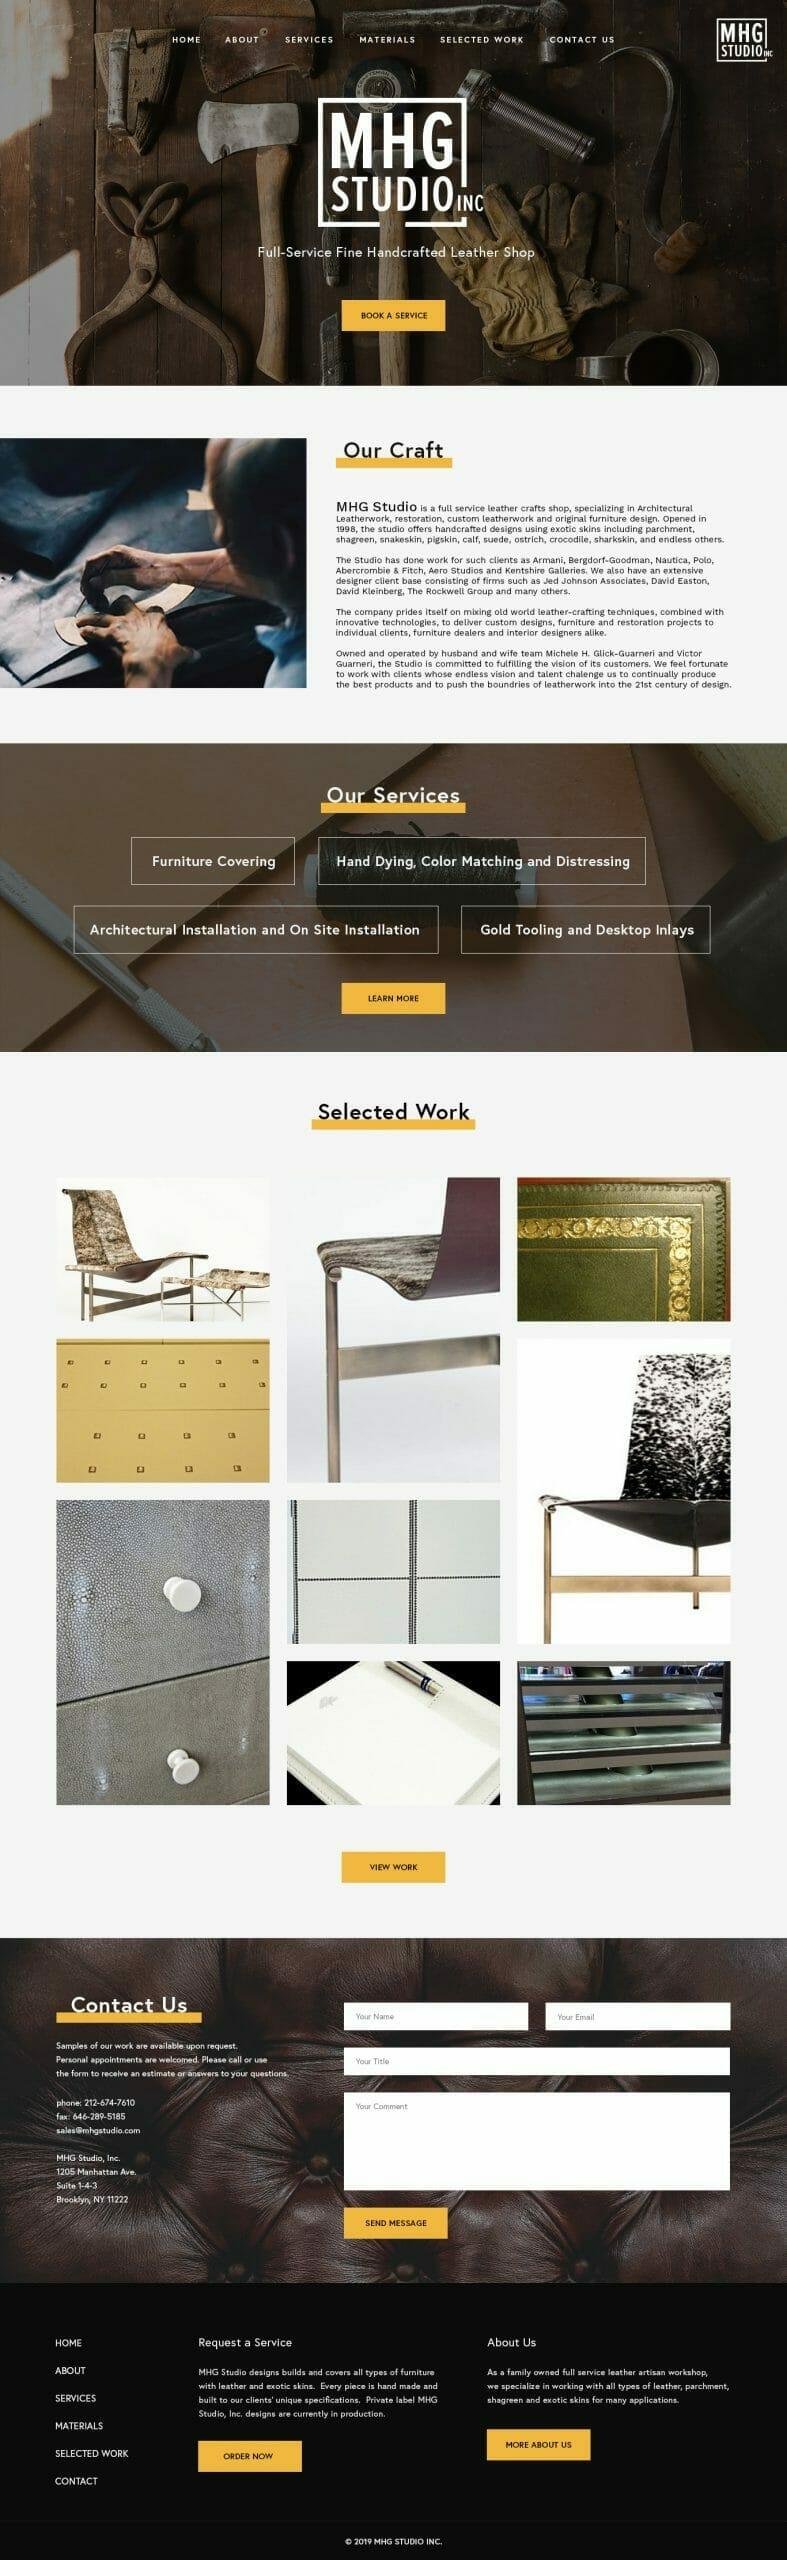 mhg studio home fullpage brooklyn new york web design bushwick design